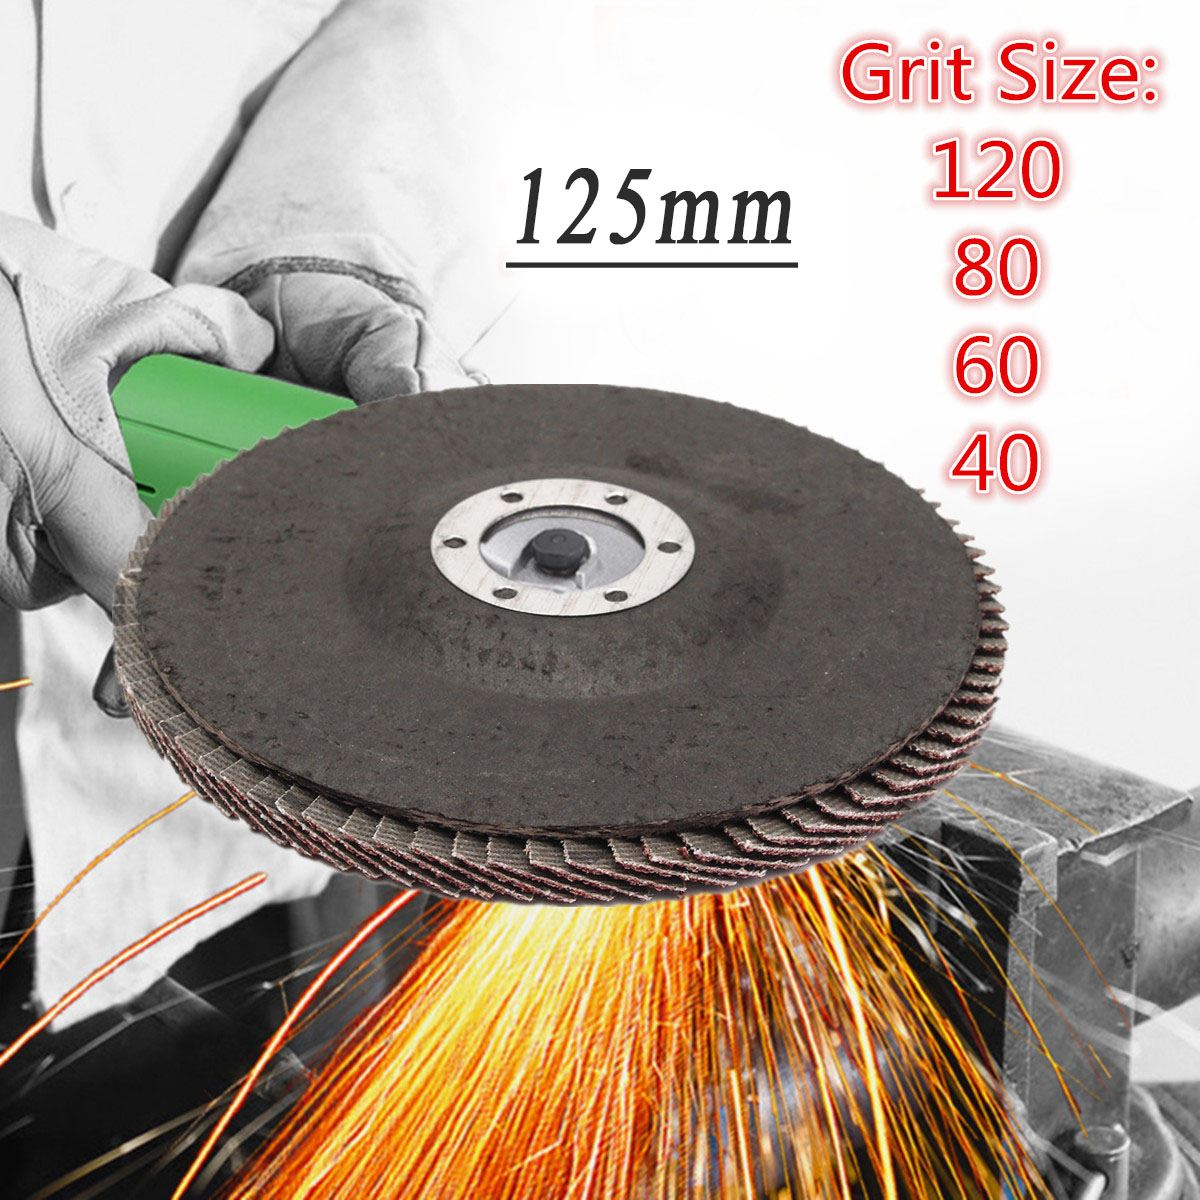 125mm 5 Inch 40/60/80/120 Grit Grinding Wheel Flap Disc Angle Grinder Sanding Tool 13000 Rpm Aluminum Oxide Abrasive Tools